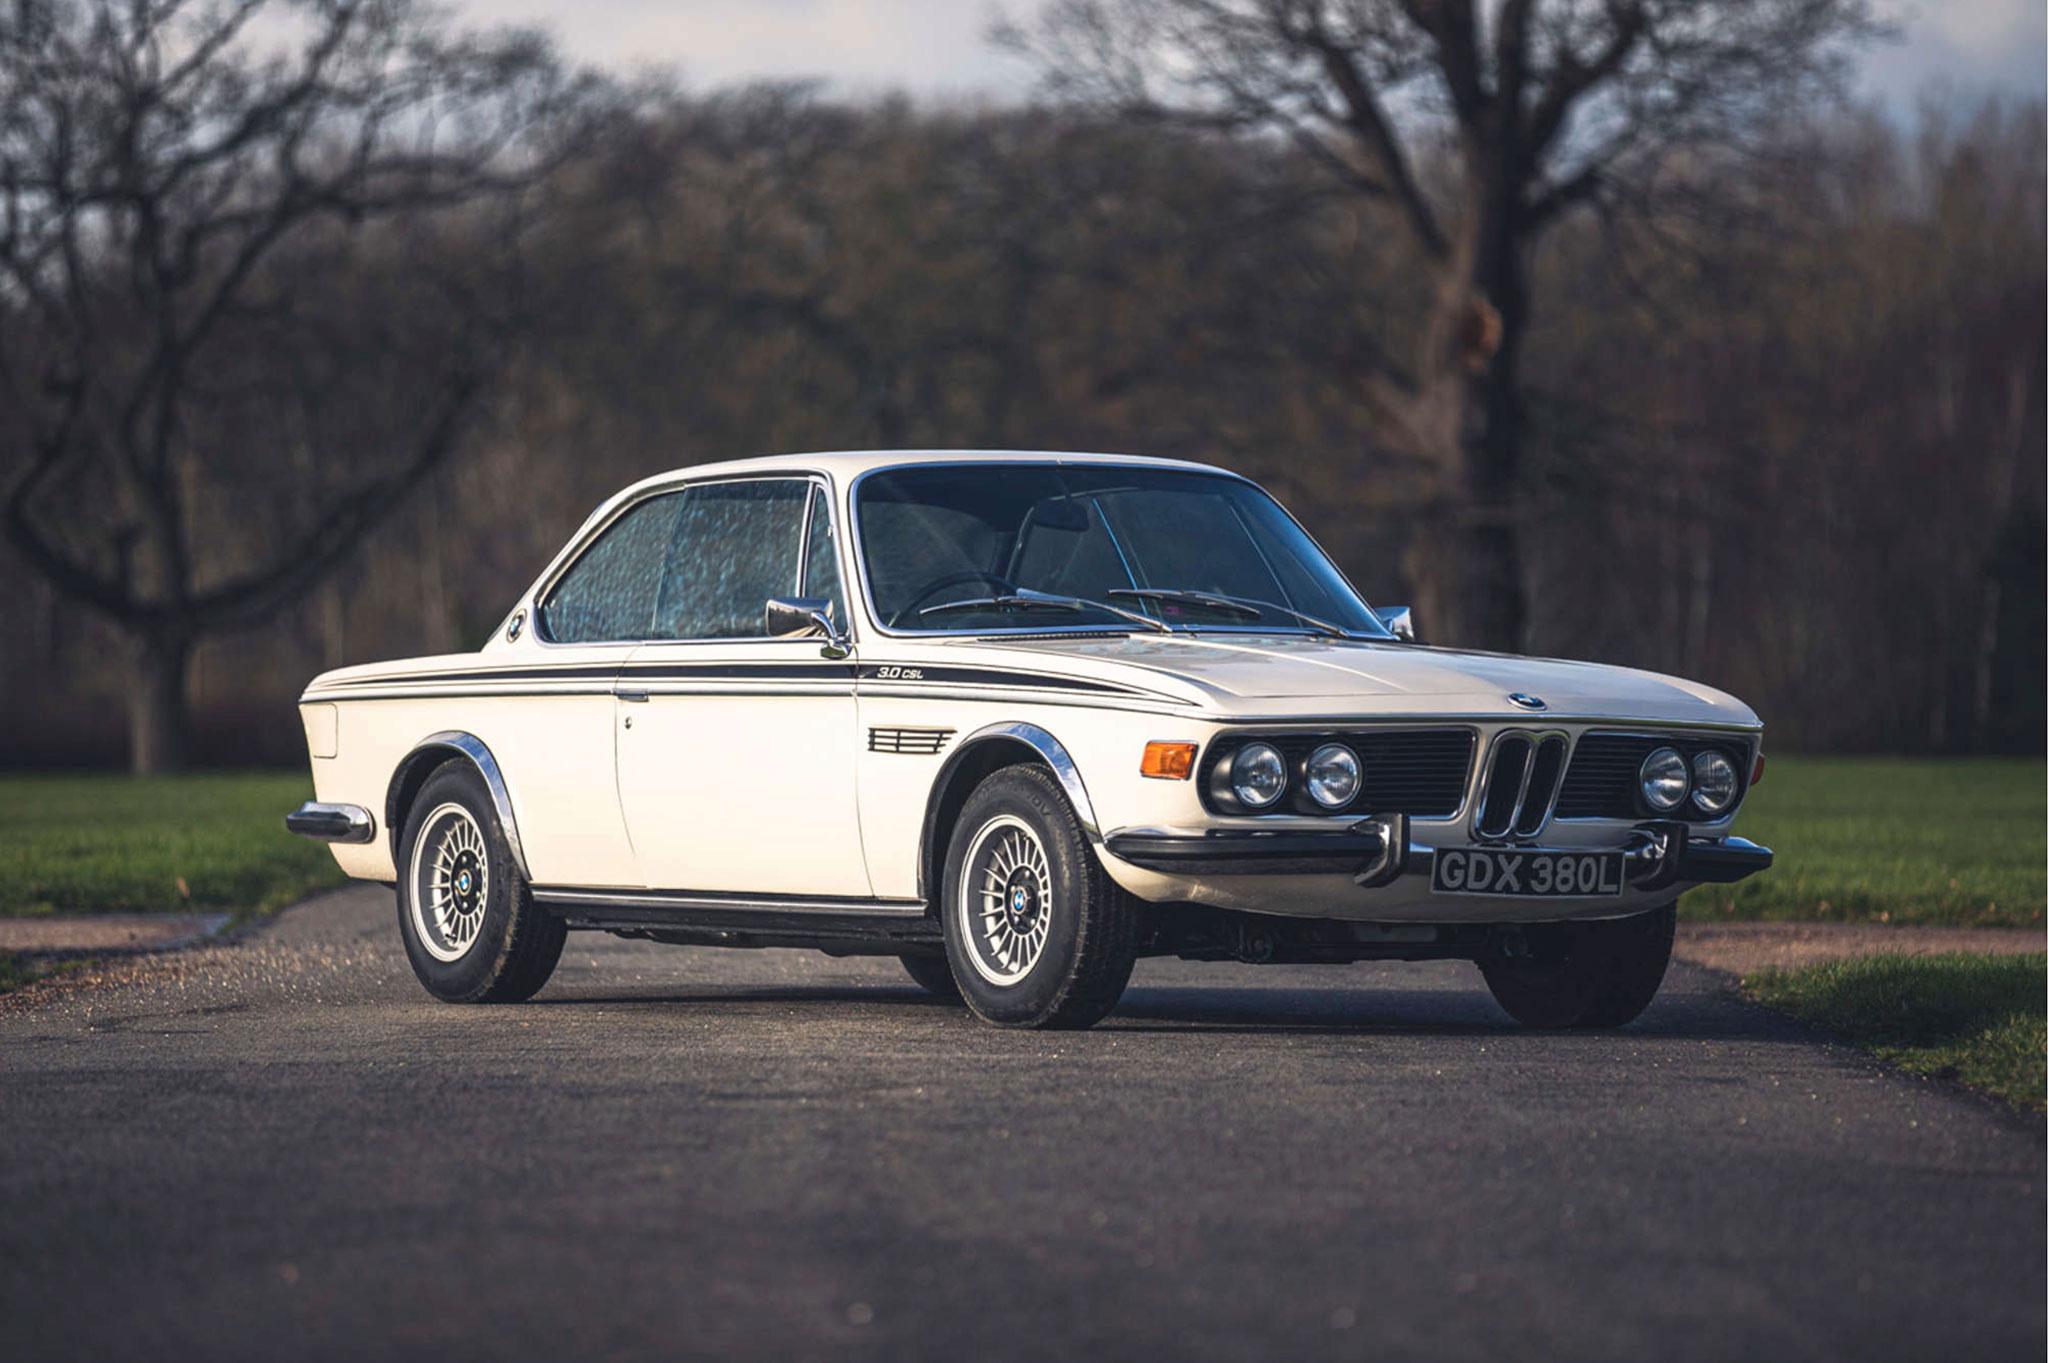 1973 BMW 3.0 CSL Silverstone Auctions 27 mars 2021 adjugée £87 750 - 50 ans BMW CSL.